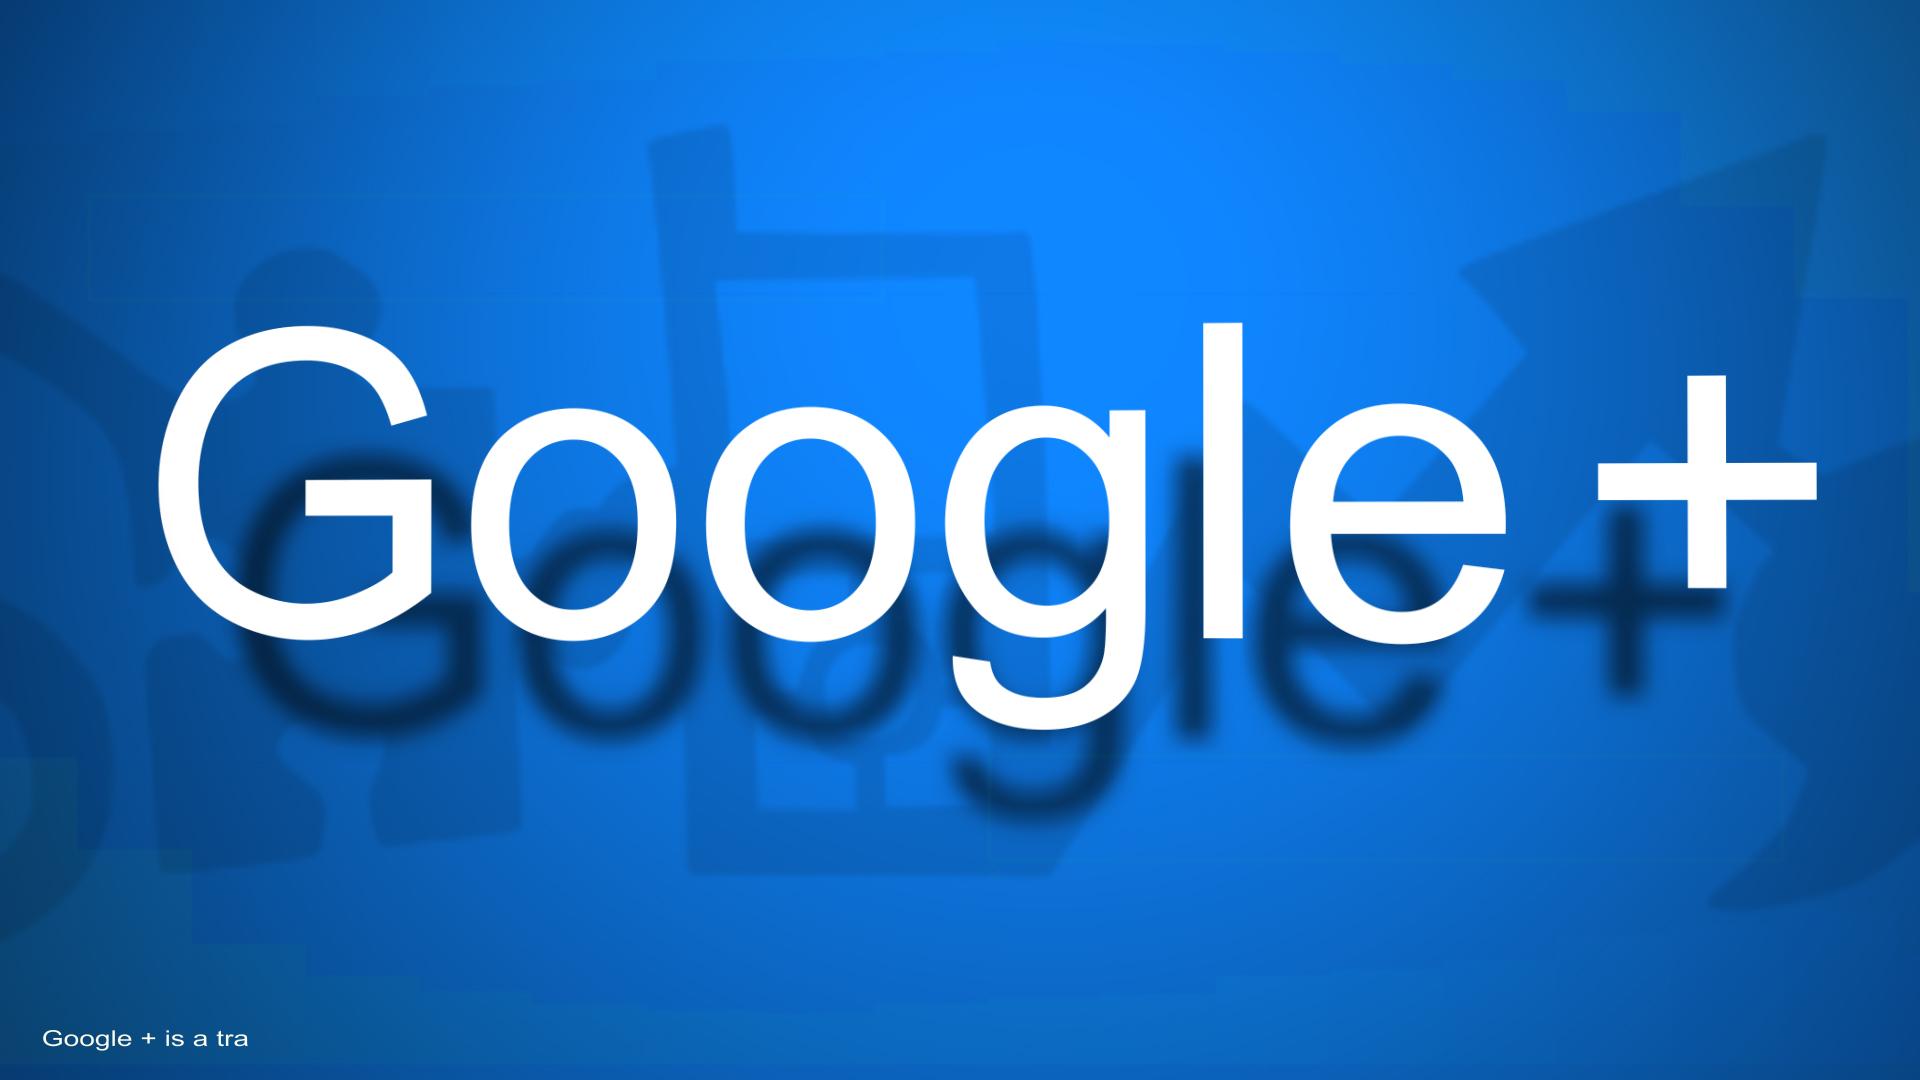 Rezultat slika za Google+